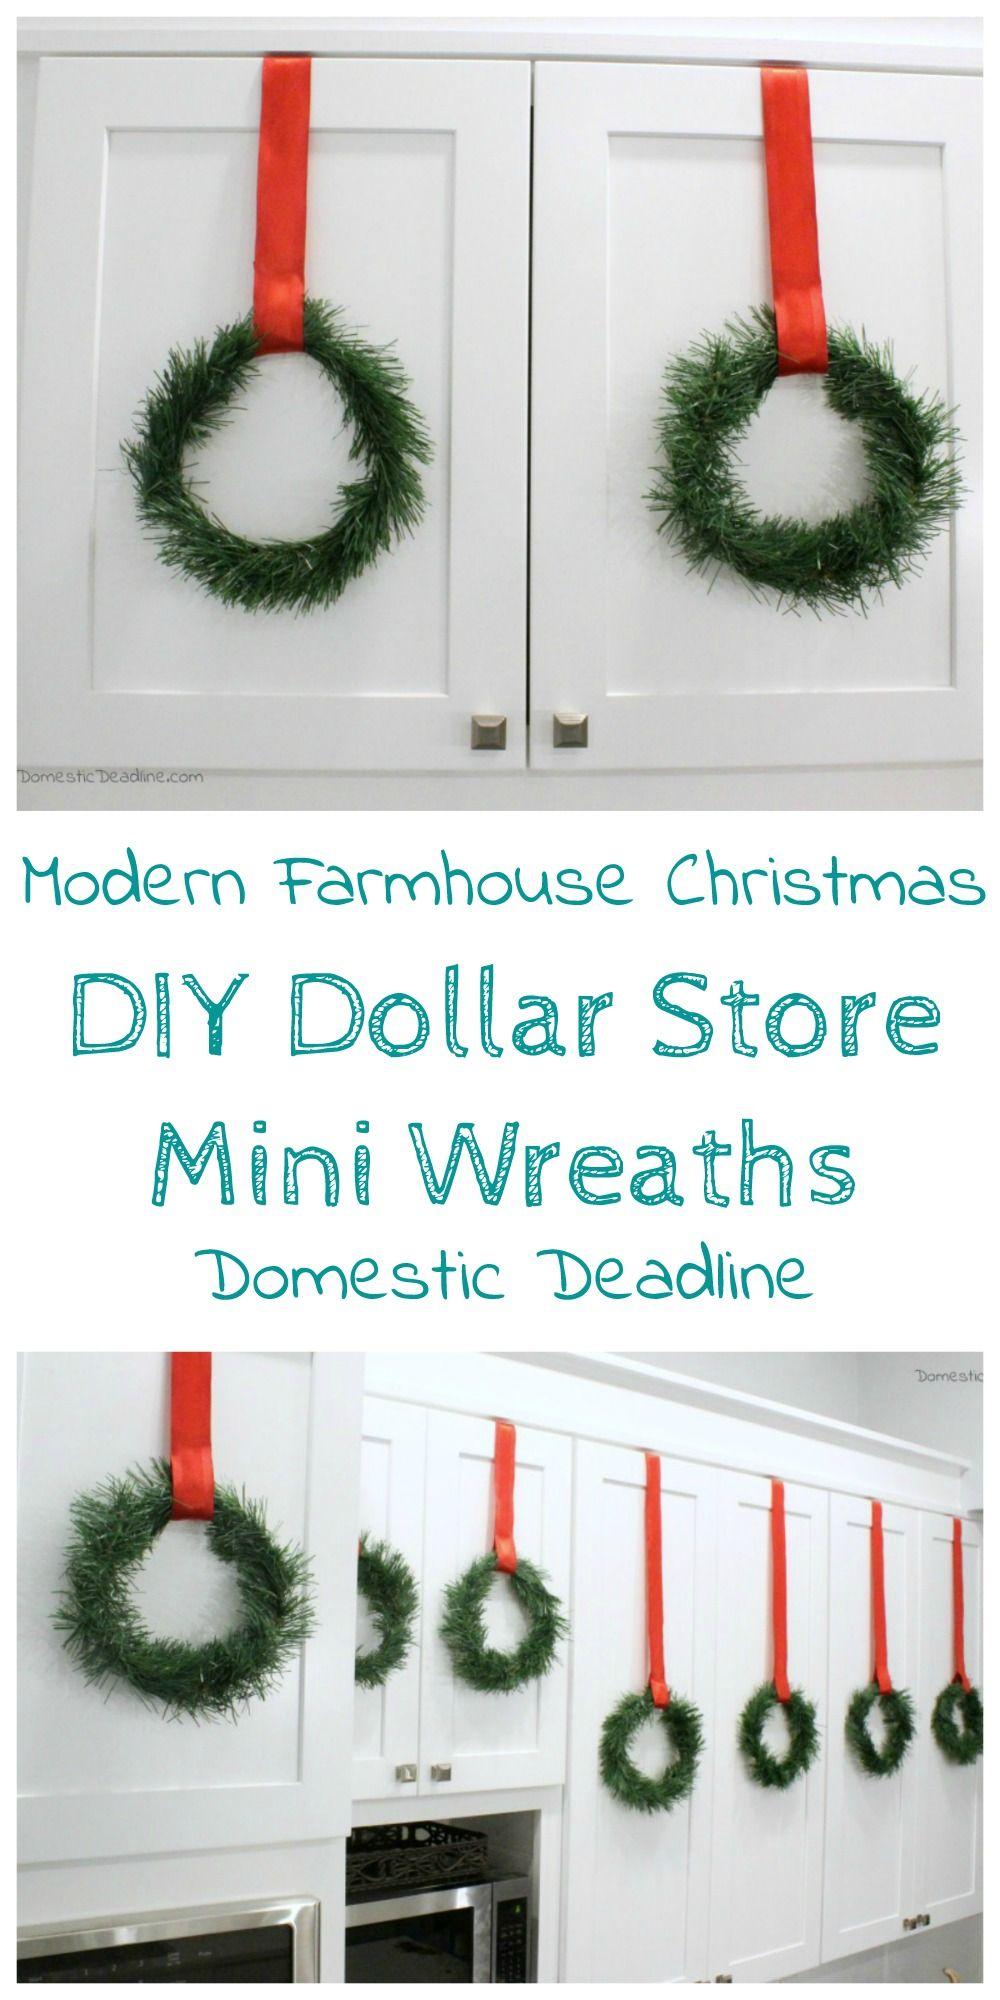 Diy Dollar Store Mini Wreaths Modern Farmhouse Christmas Domestic Deadline Cheap Christmas Diy Dollar Store Diy Diy Holiday Decor